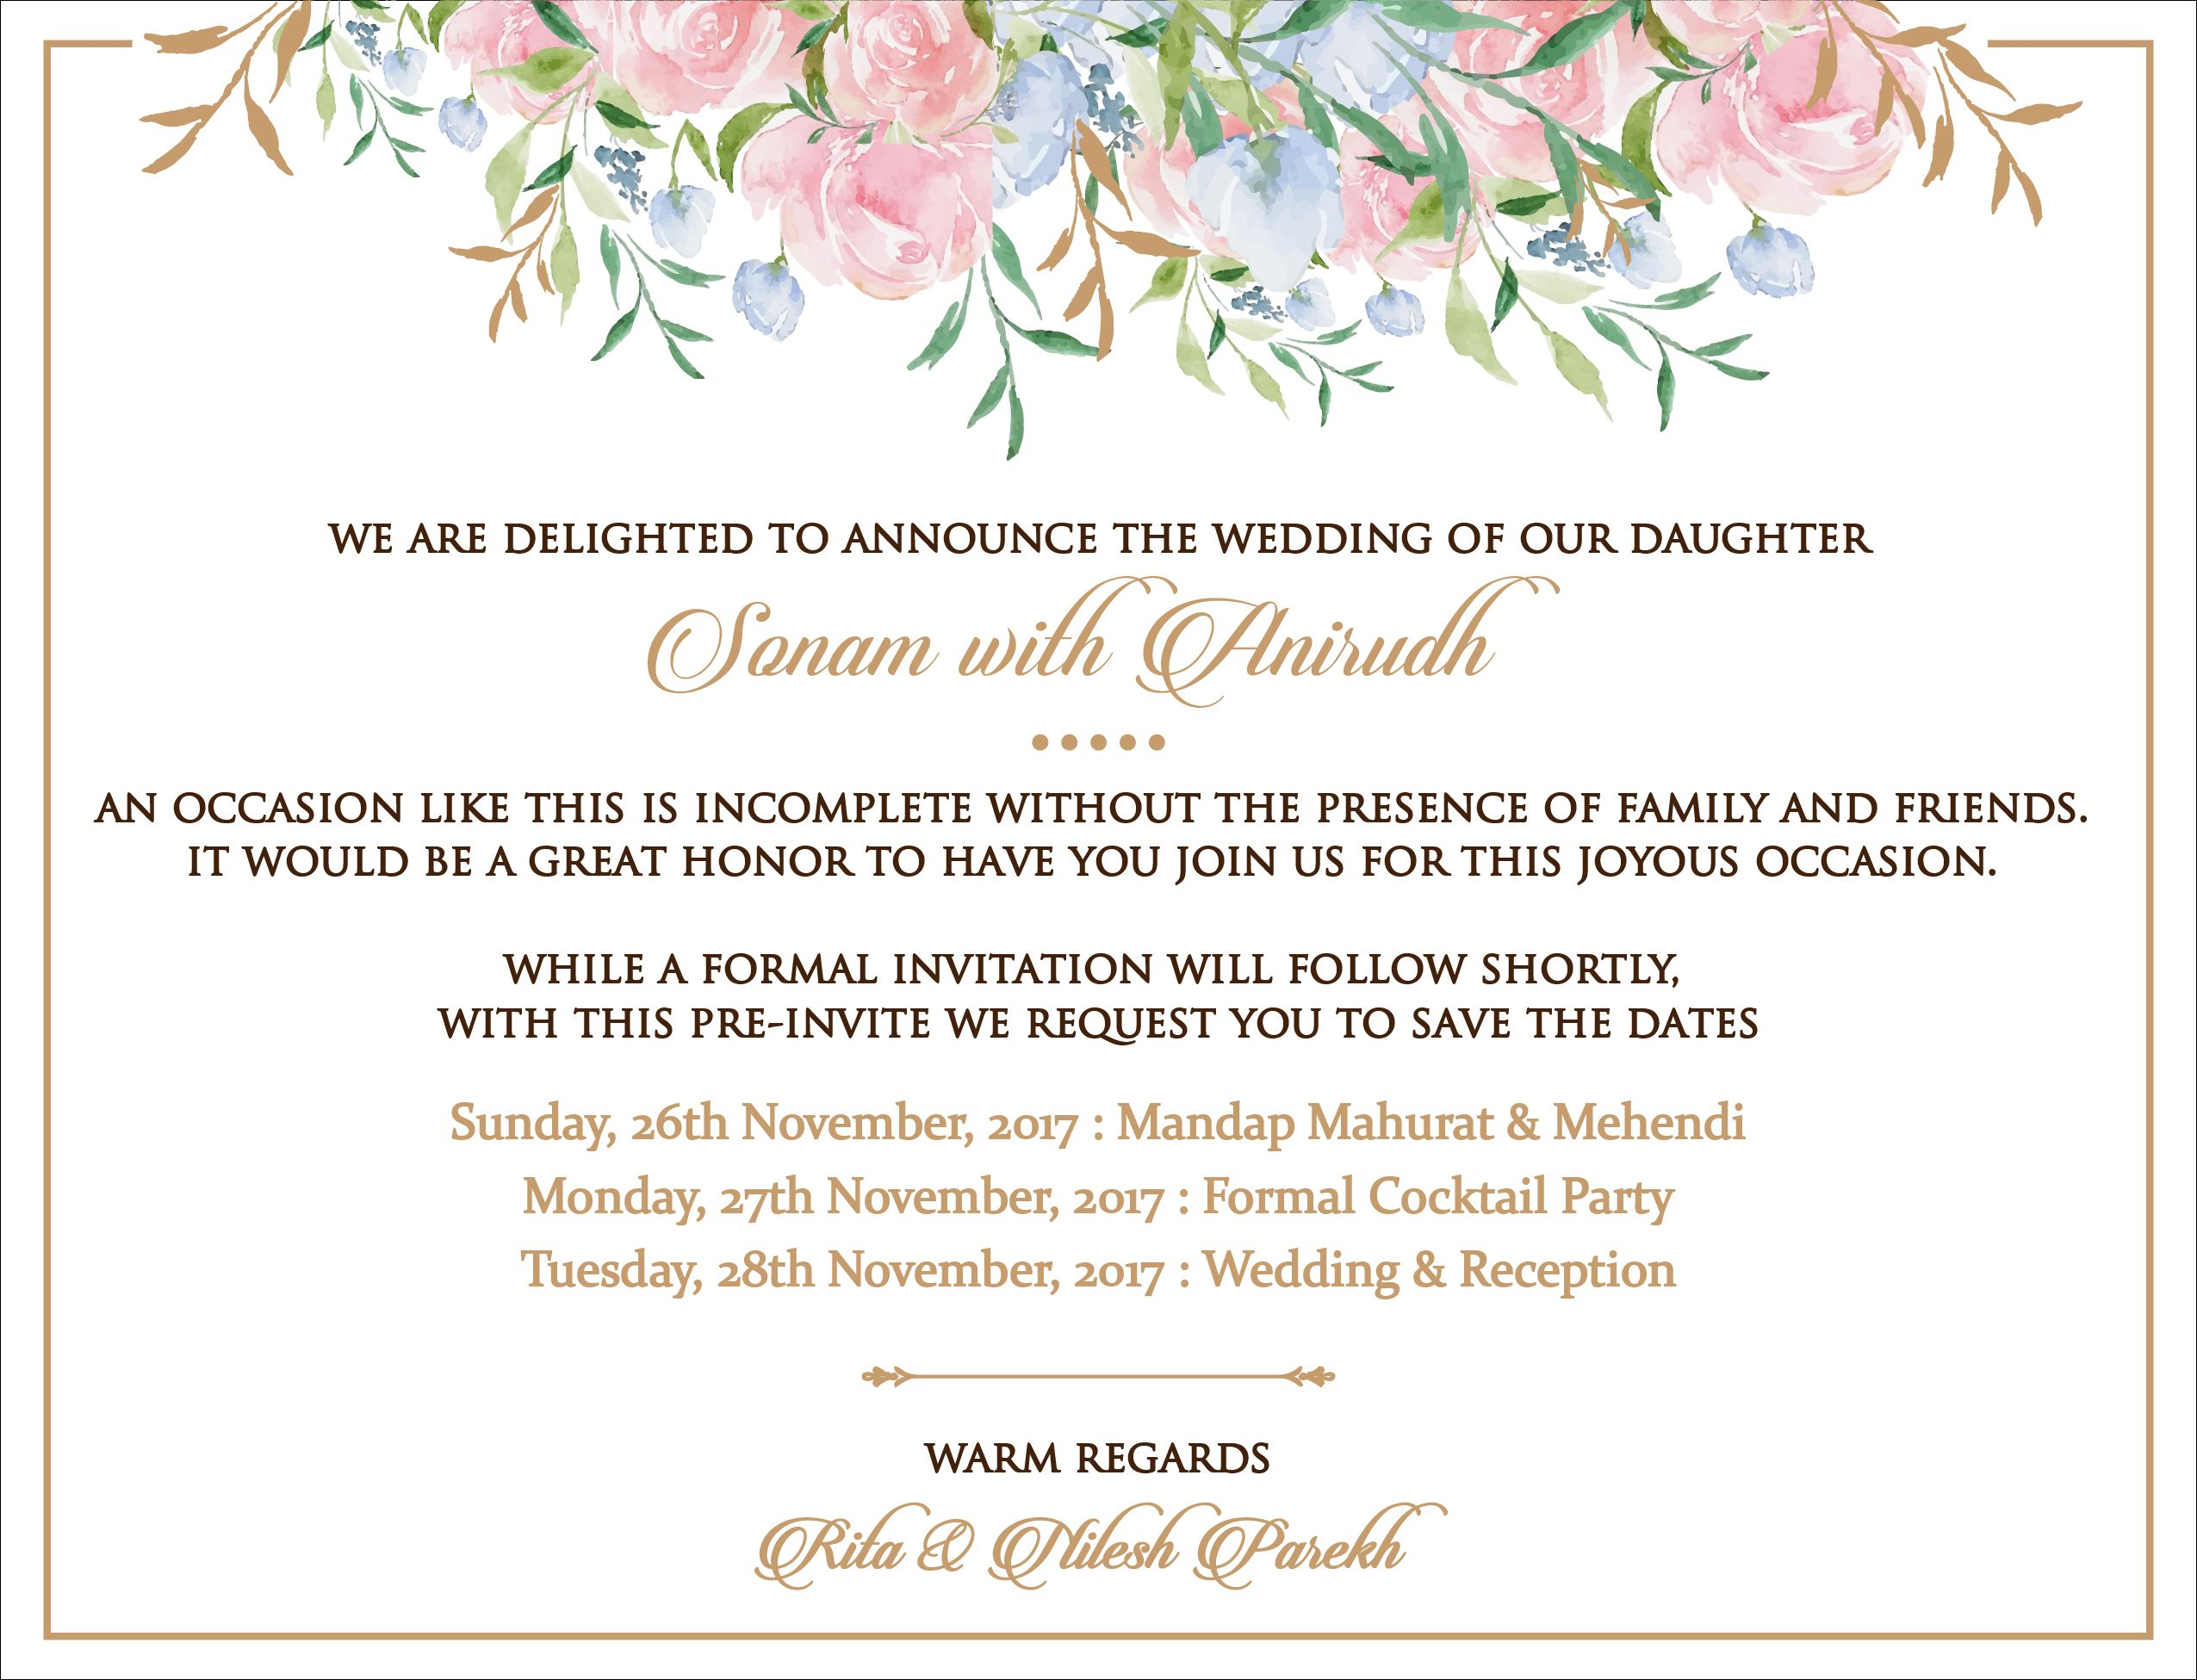 Wedding Invitation Cards Indian Wedding Cards Invites Wedding Stationery Customized Invitations Cu Indian Wedding Cards Wedding Cards Simple Wedding Cards